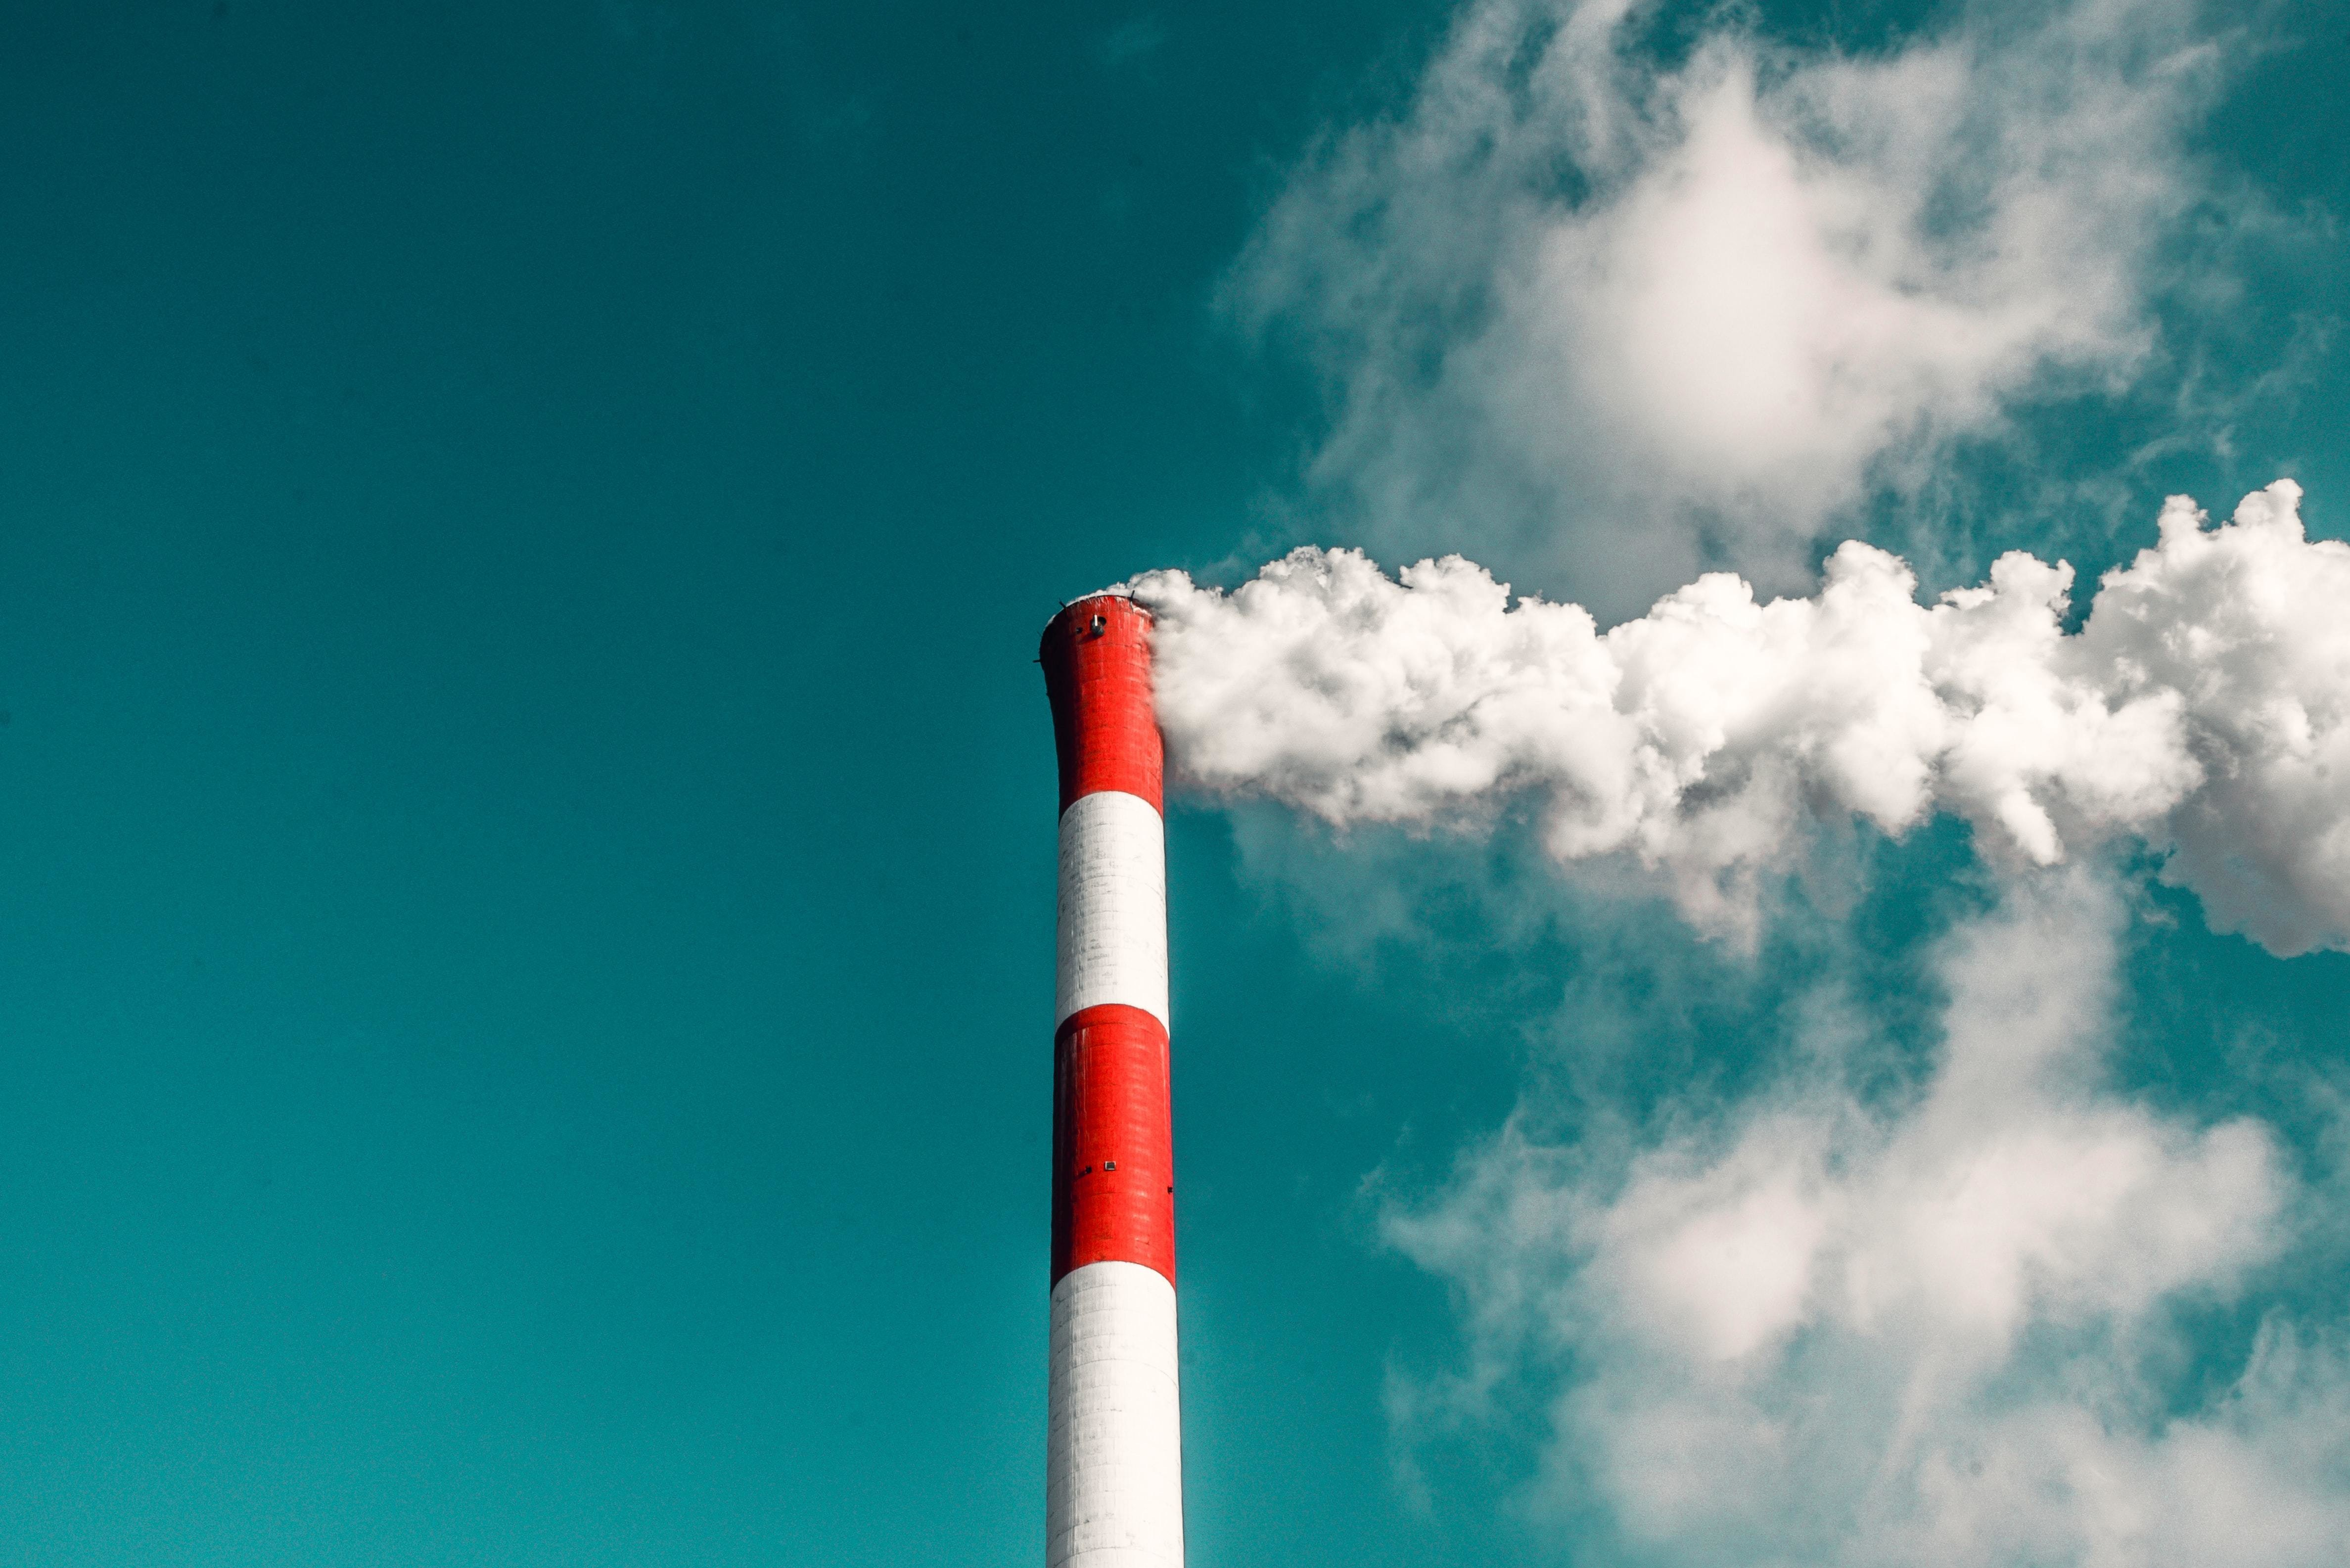 Industrial chimney billowing white smoke.